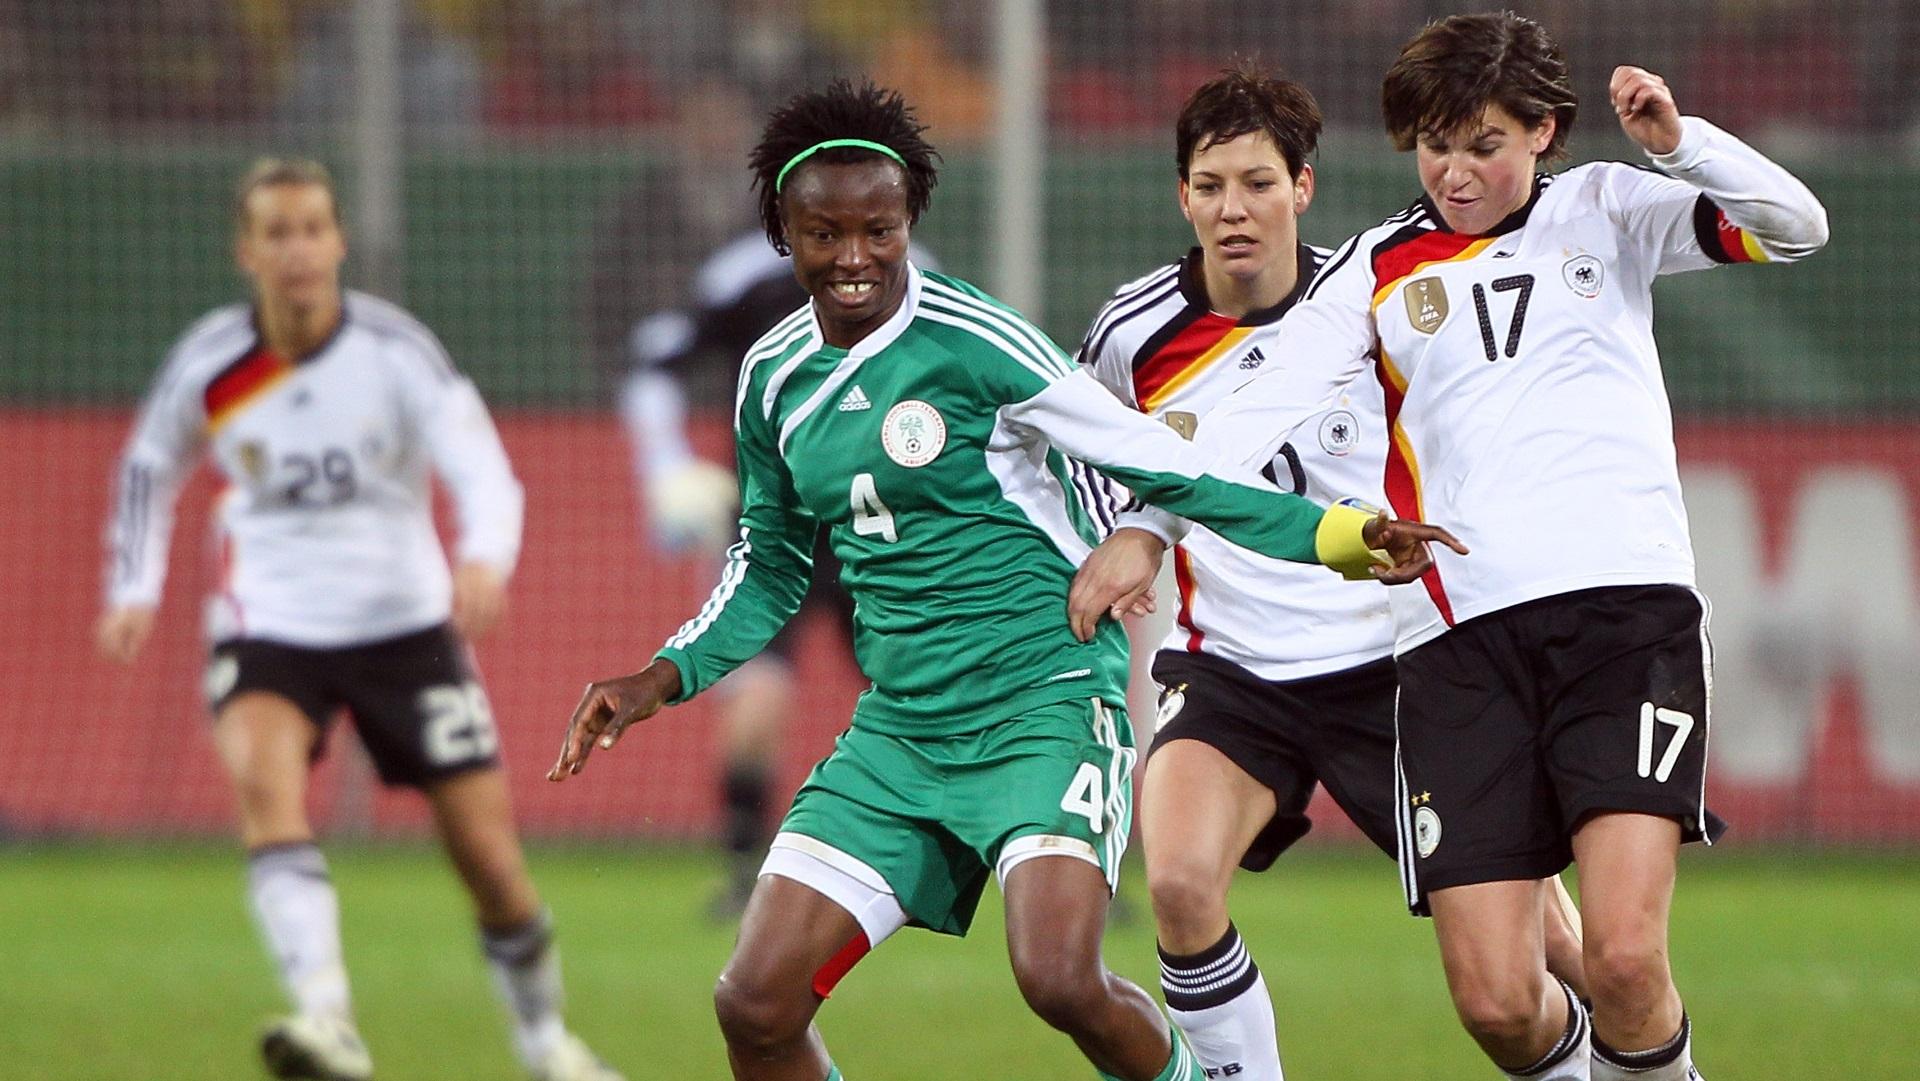 Perpetua Nkwocha of Nigeria vs. Germany